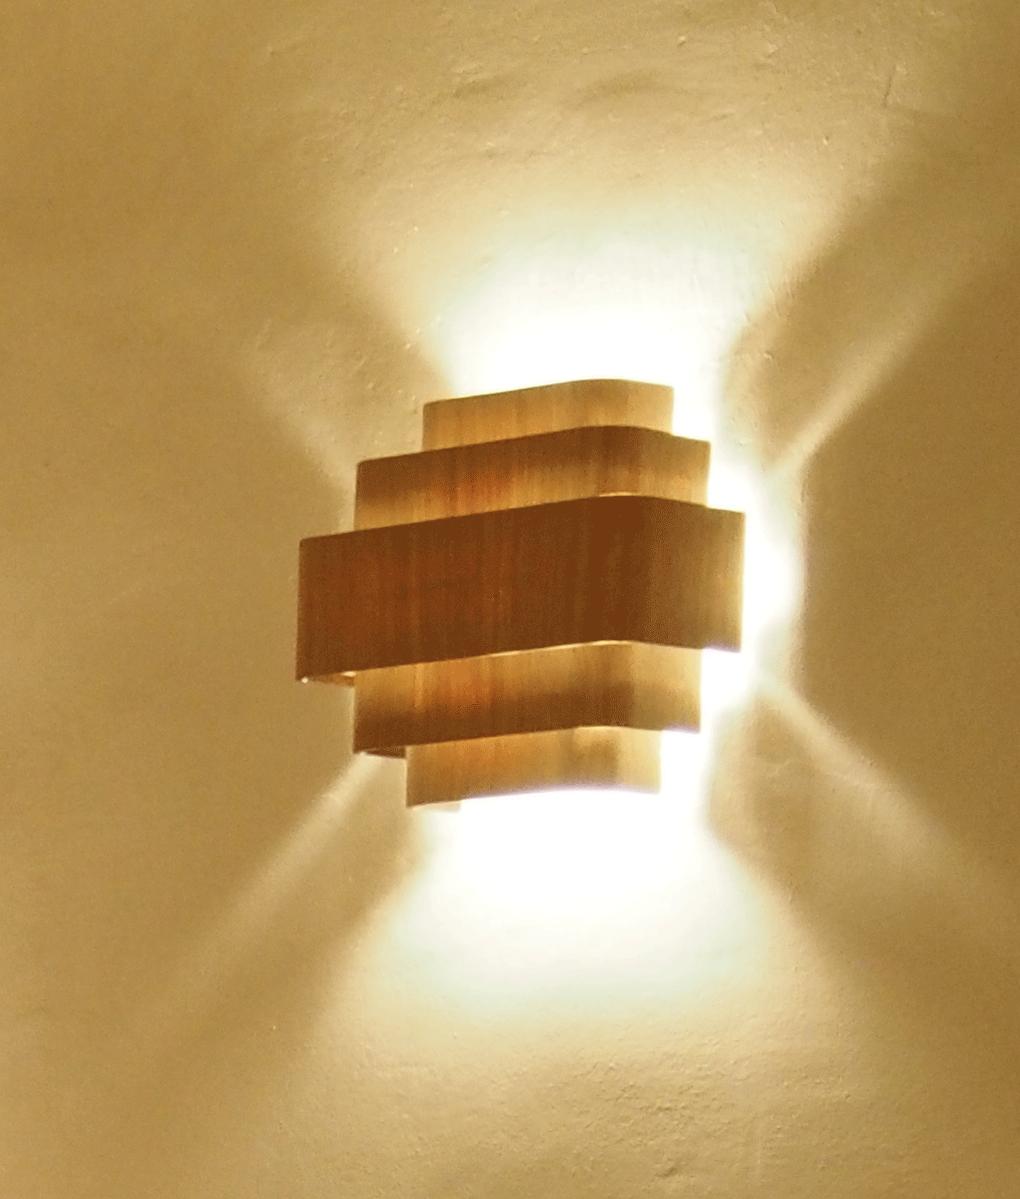 Wengé Applique Bois Lampe; Murale Made France Finition Chêne In Ou N0vm8wyOn